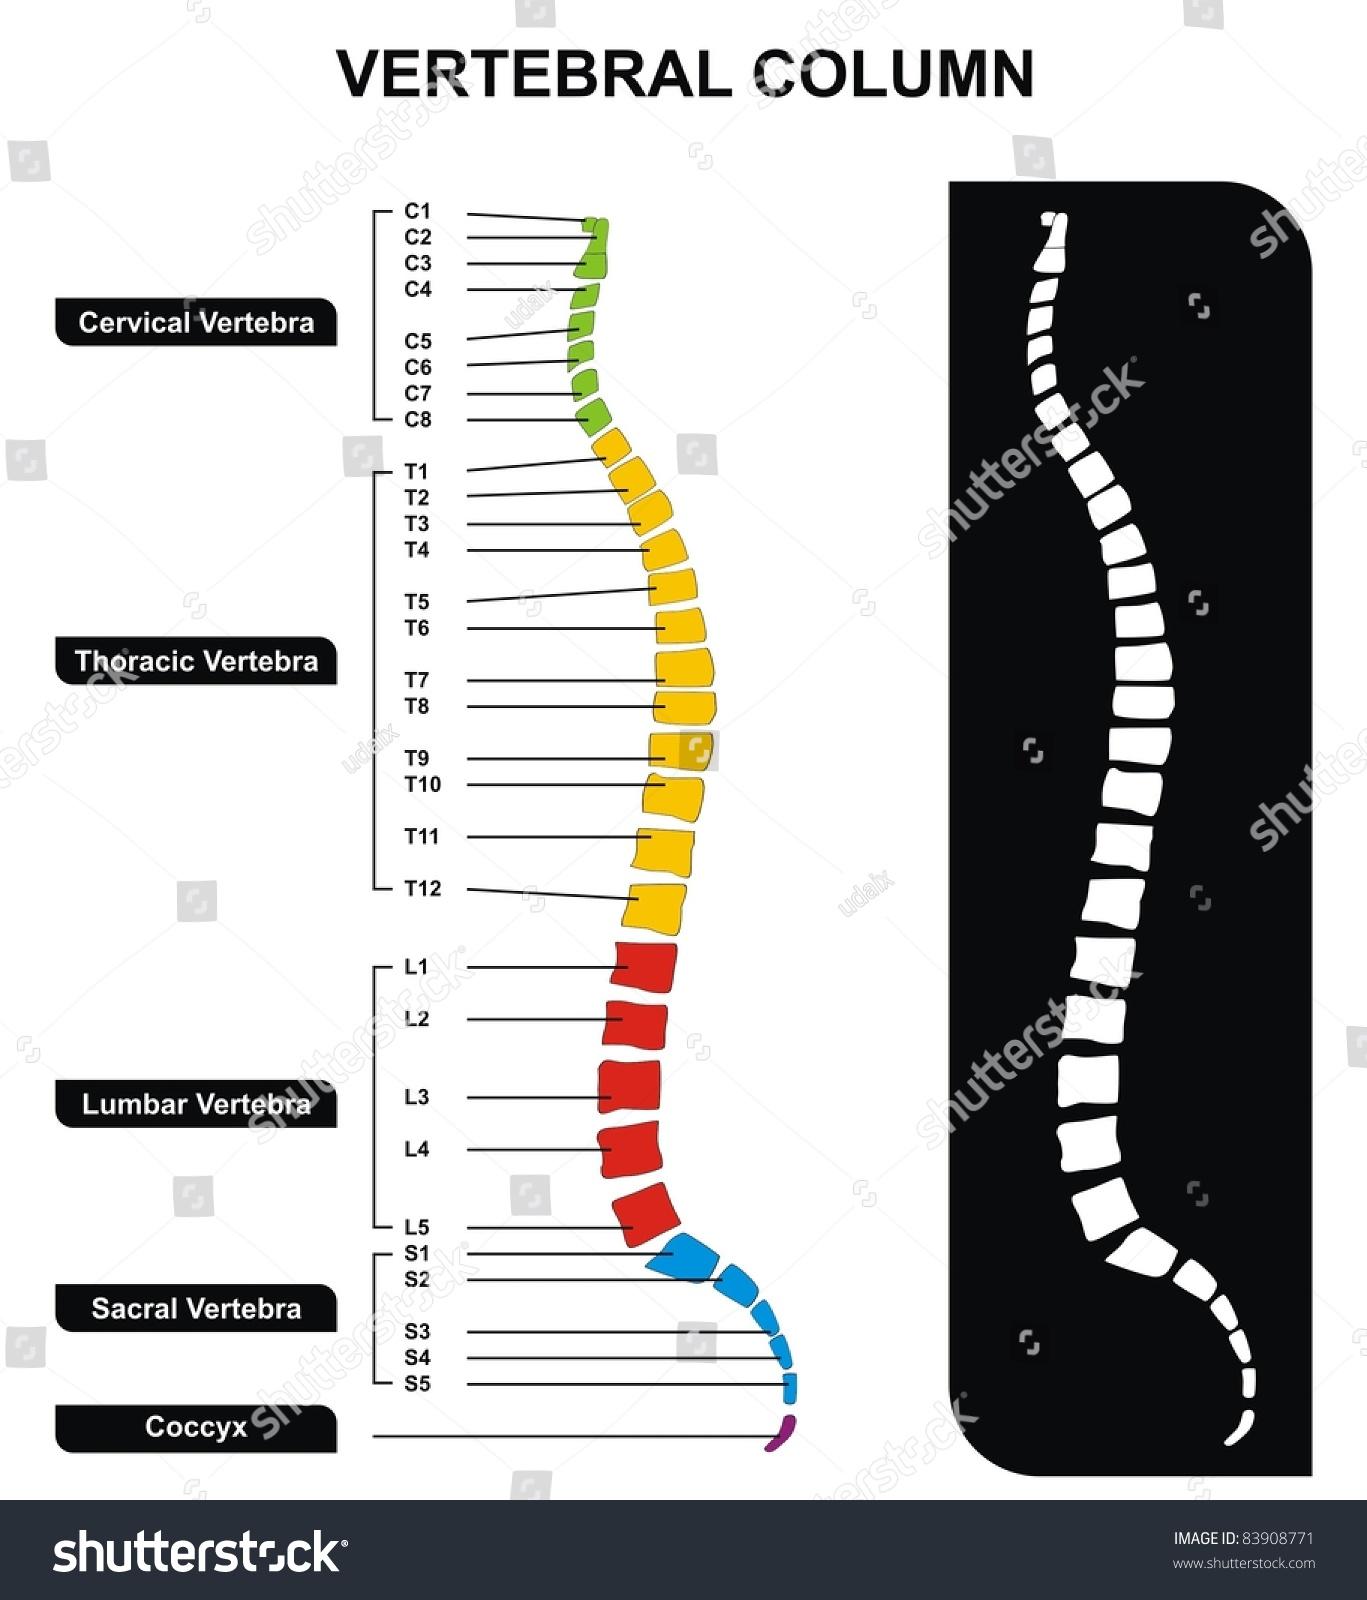 Vertebral Column Vertebral Column Groups